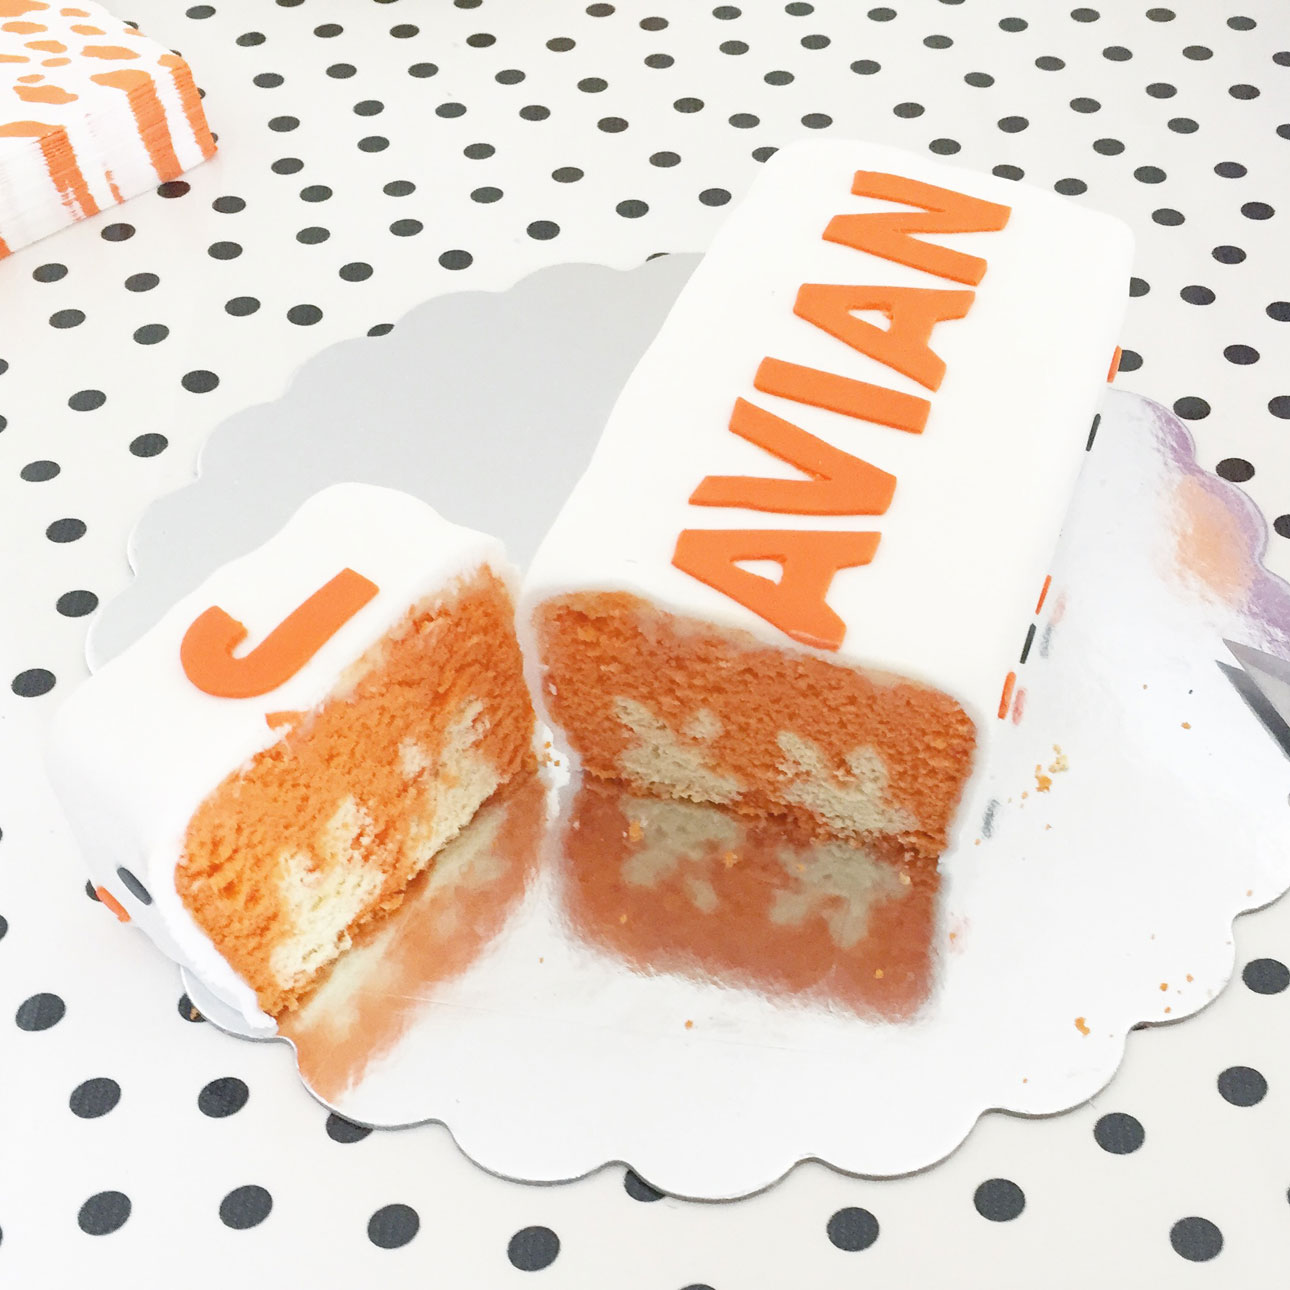 Nijntje verjaardag kiekeboe taart